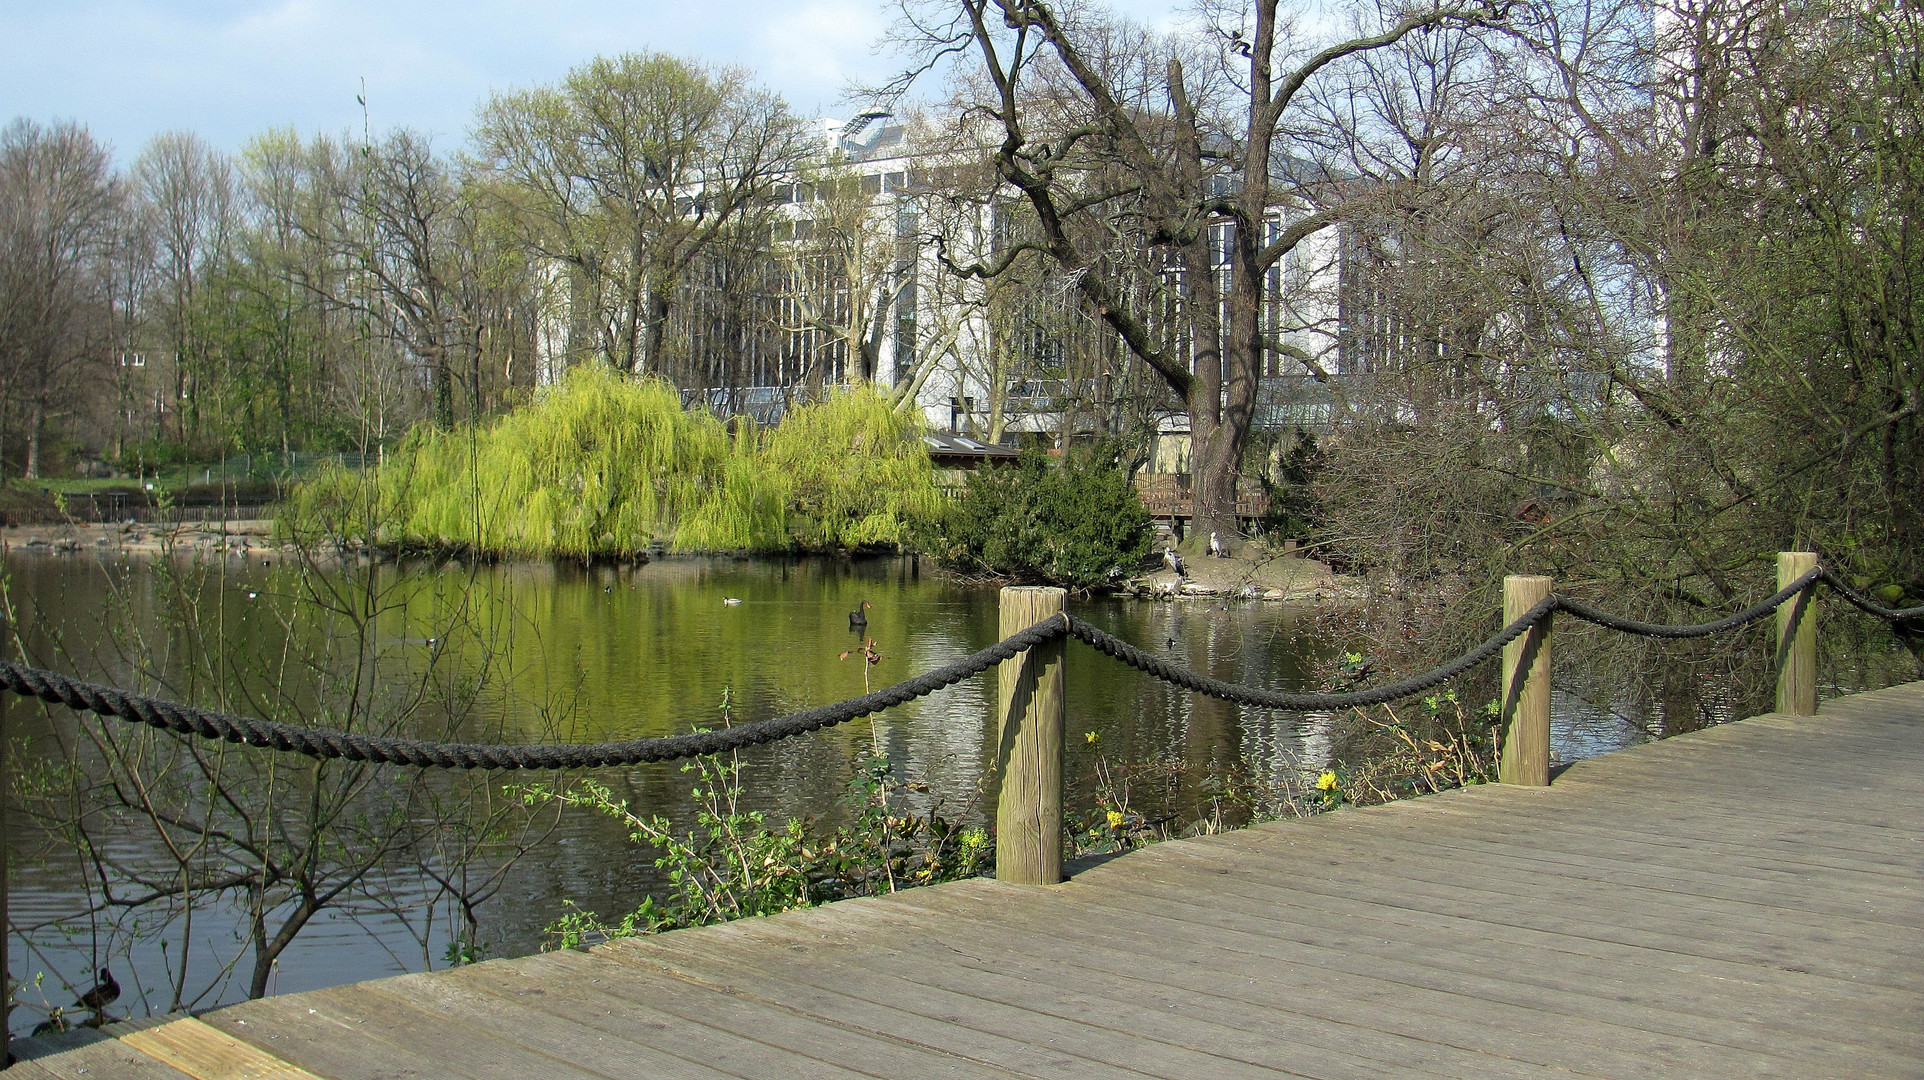 Zoo-Teich im Frühling